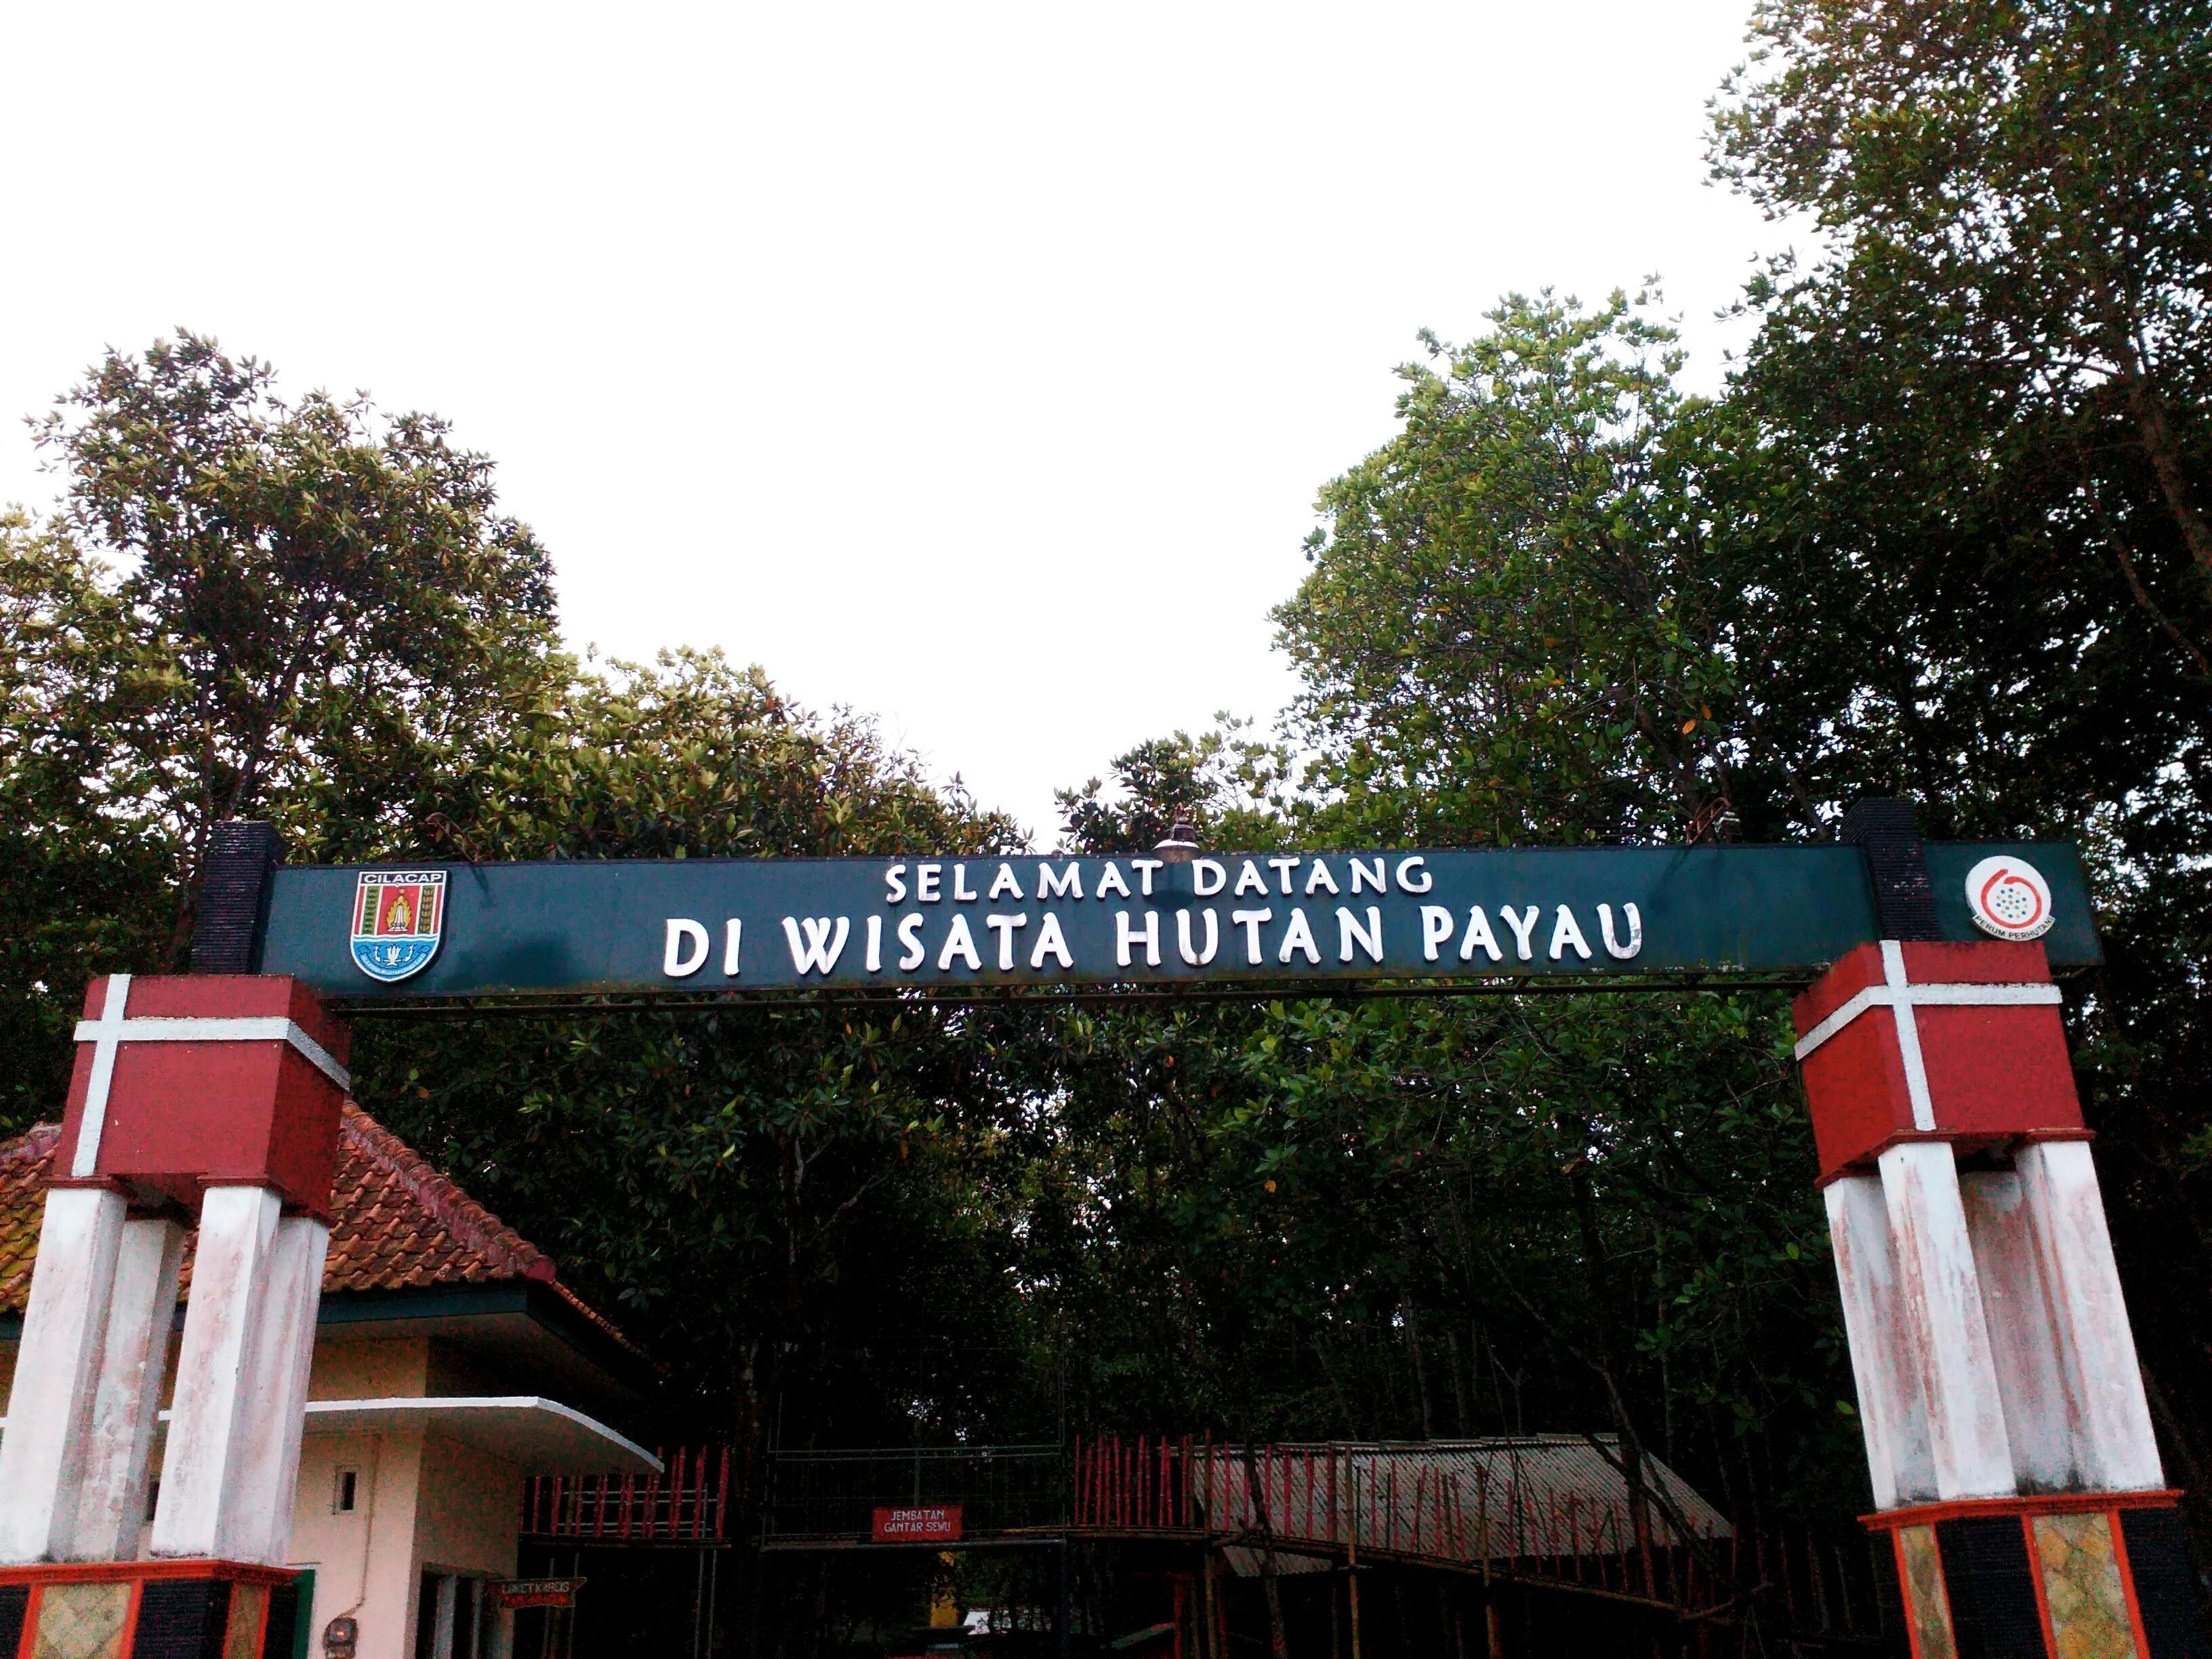 Cilacap 1 Menyelusuri Wisata Hutan Payau Steemit 1990 Salah Satu